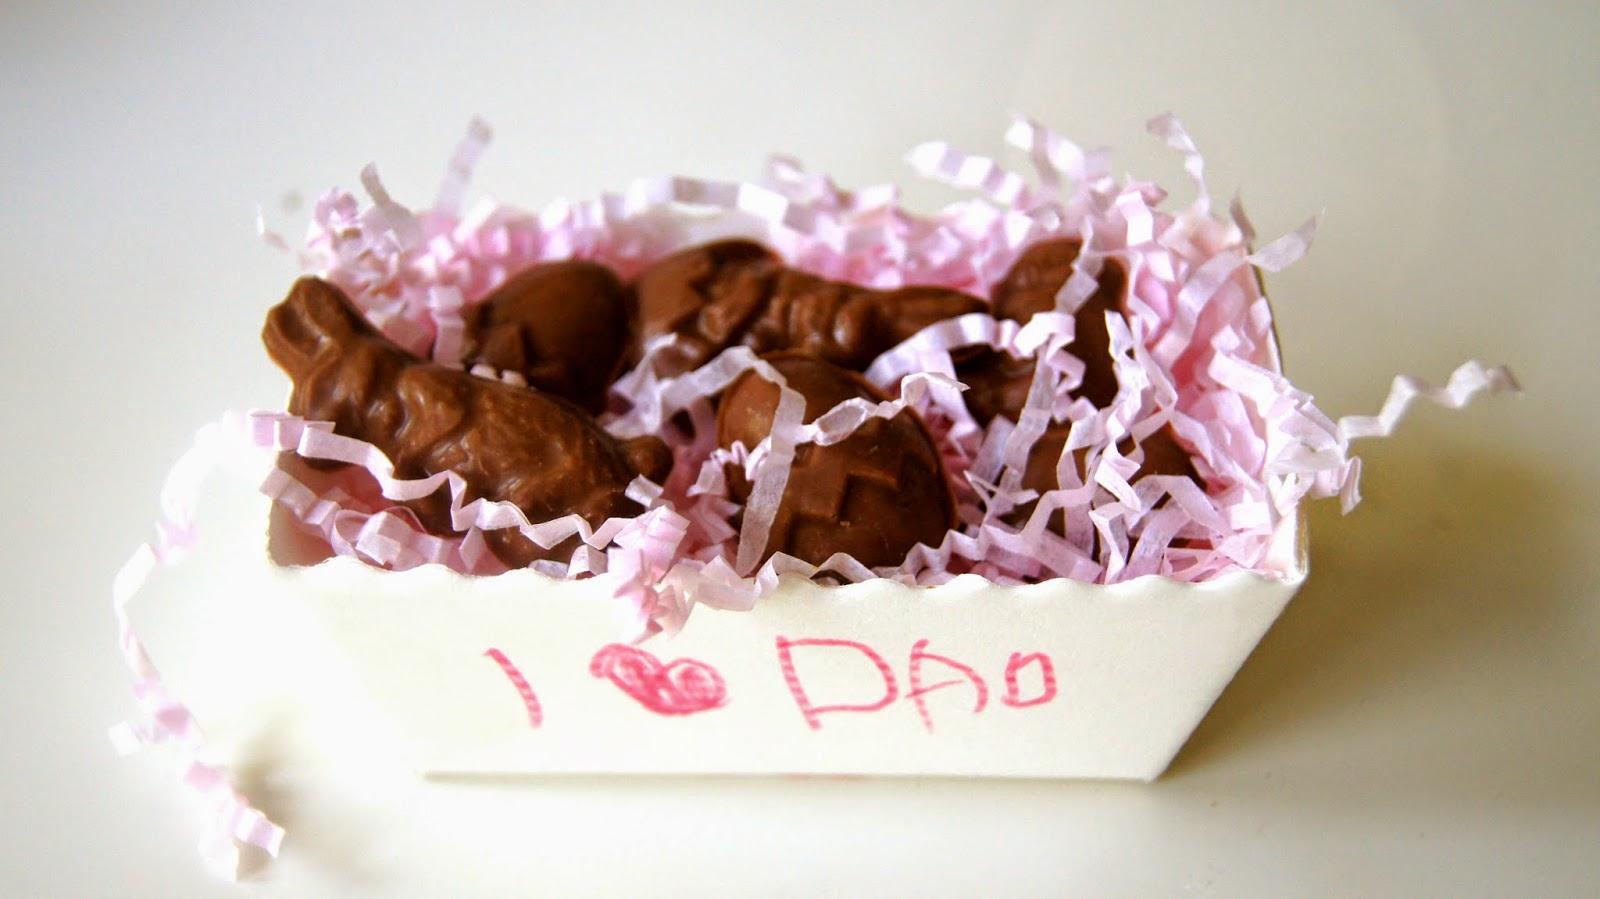 http://froggooseandbear.blogspot.com.au/2013/03/an-easter-chocolate-gift-tutorial.html